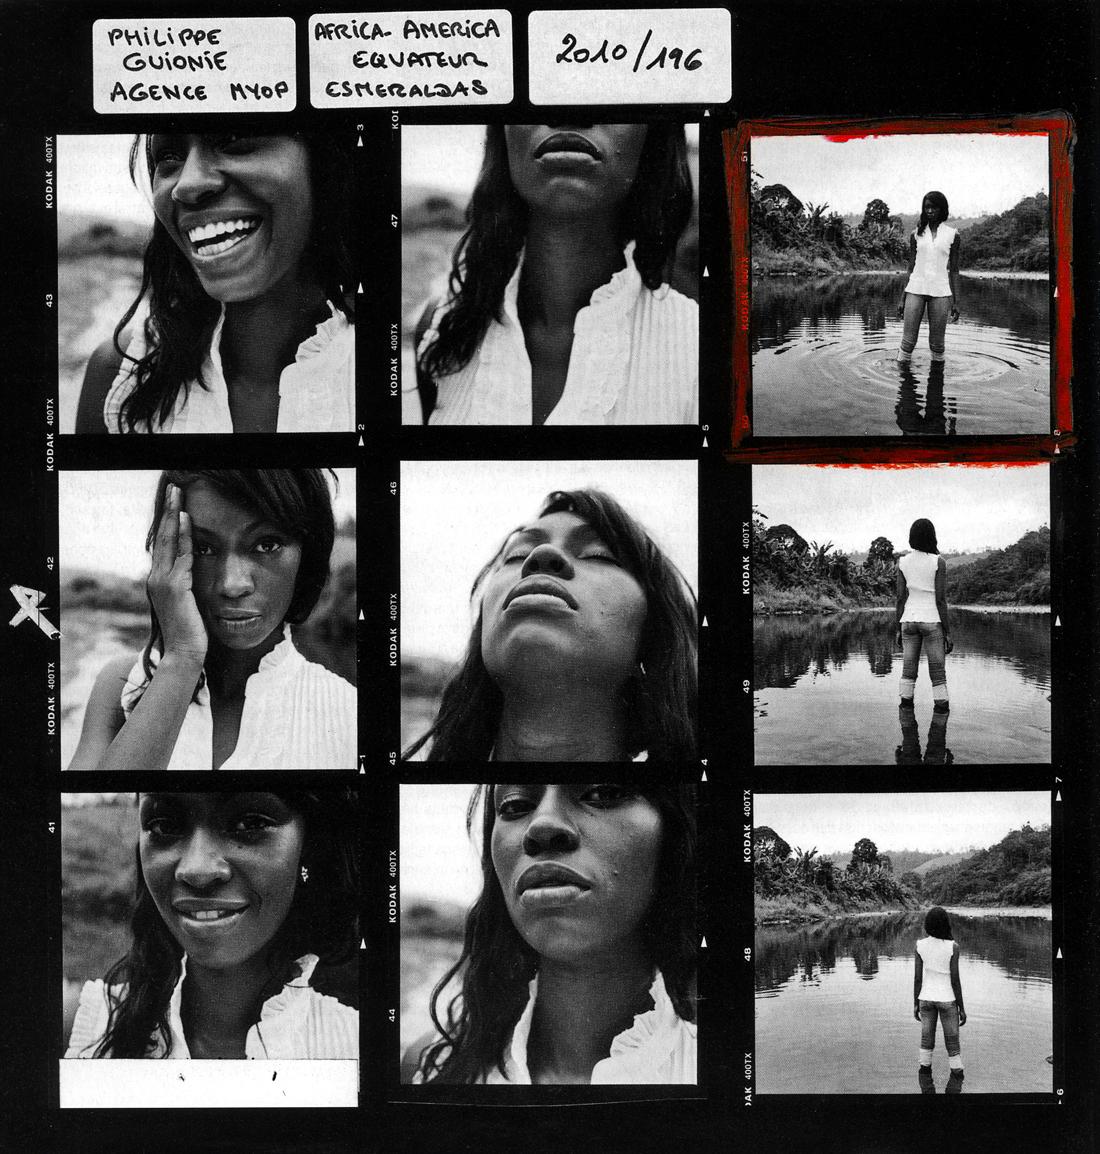 1d2fd4a6cfd Έχοντας αφιερώσει πάνω από 10 χρόνια στη σειρά του «Les tirailleurs et les  trios fleuves», σχετικά με τους τελευταίους ανιχνευτές του Κονγκό, της  Σενεγάλης ...